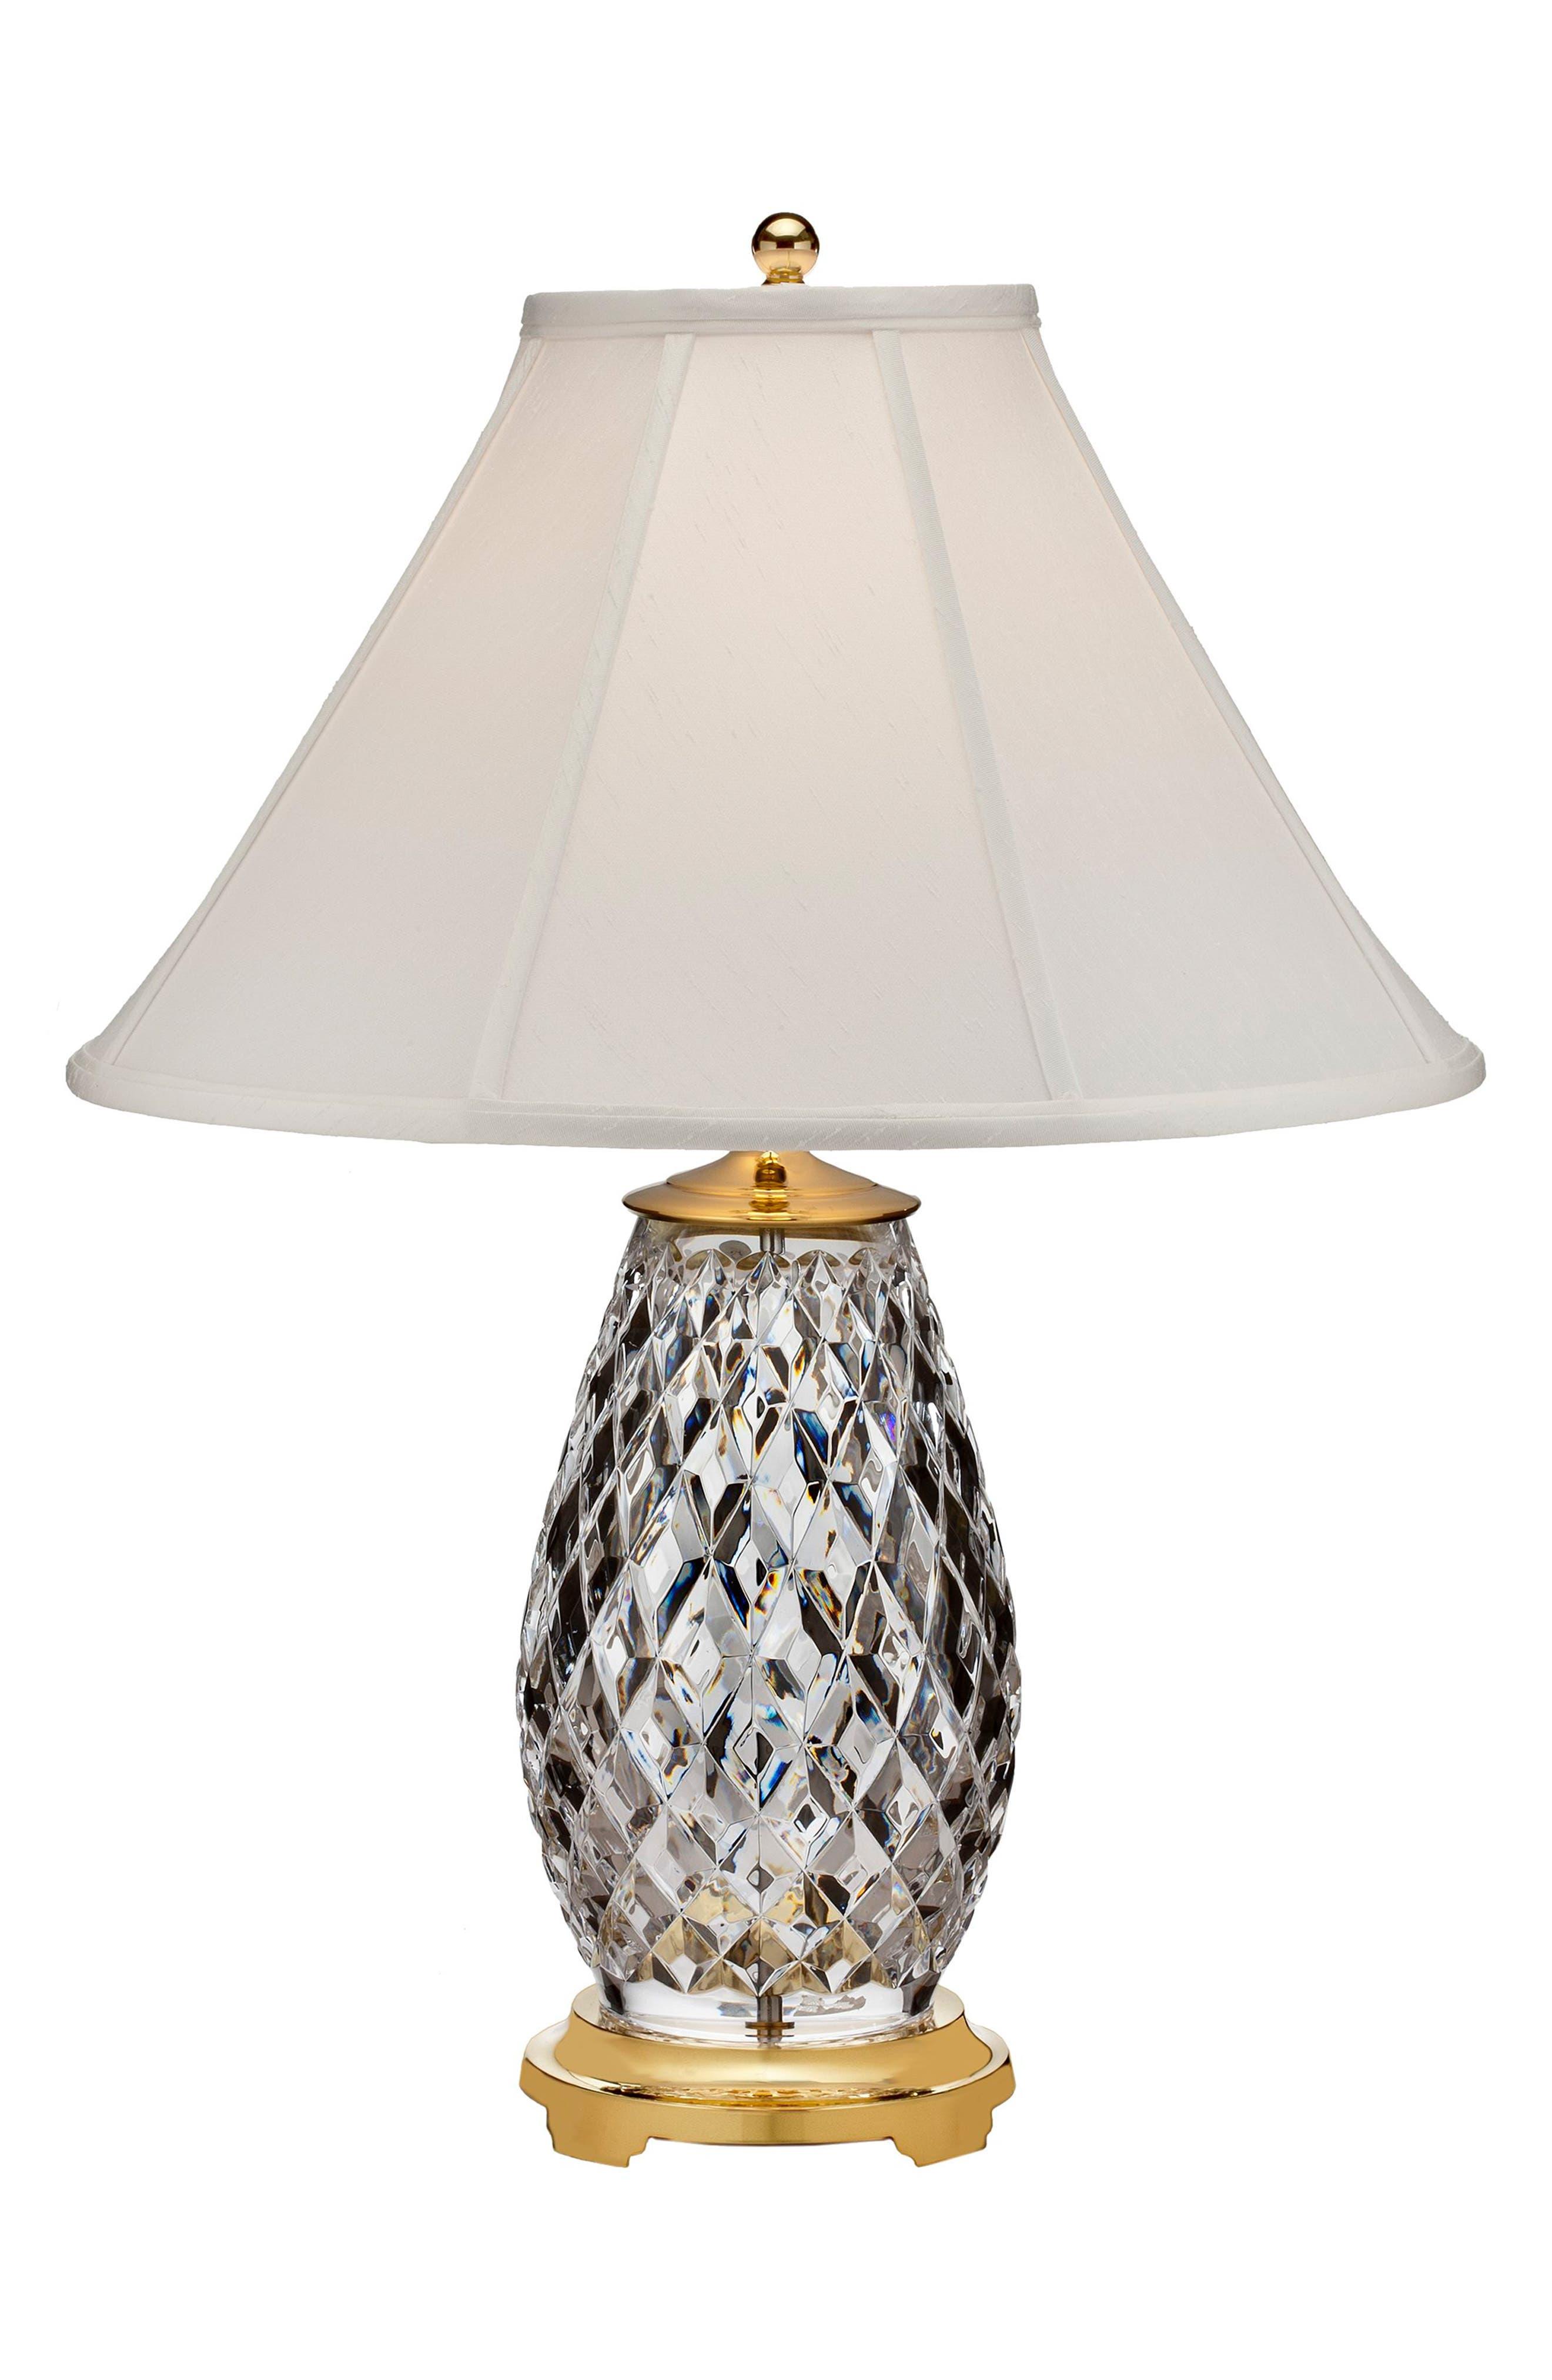 Waterford Diama Crystal Table Lamp